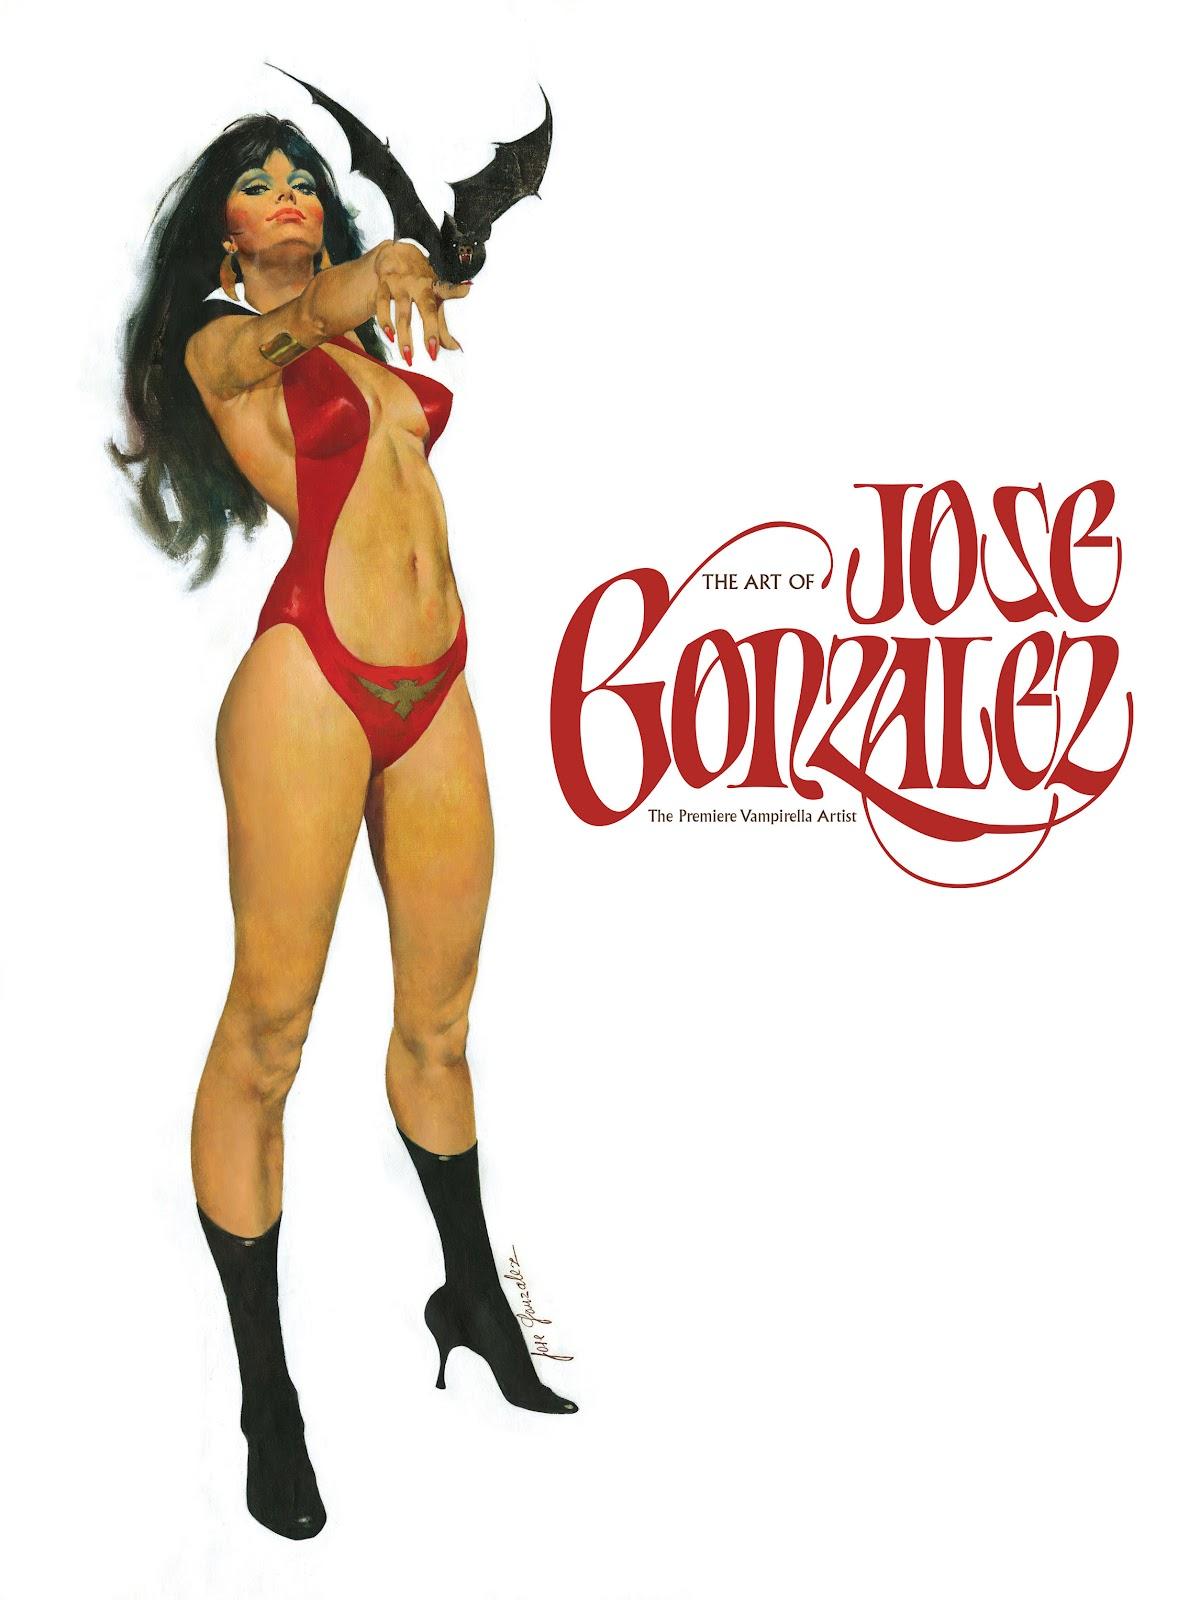 Read online The Art of Jose Gonzalez comic -  Issue # TPB (Part 1) - 2